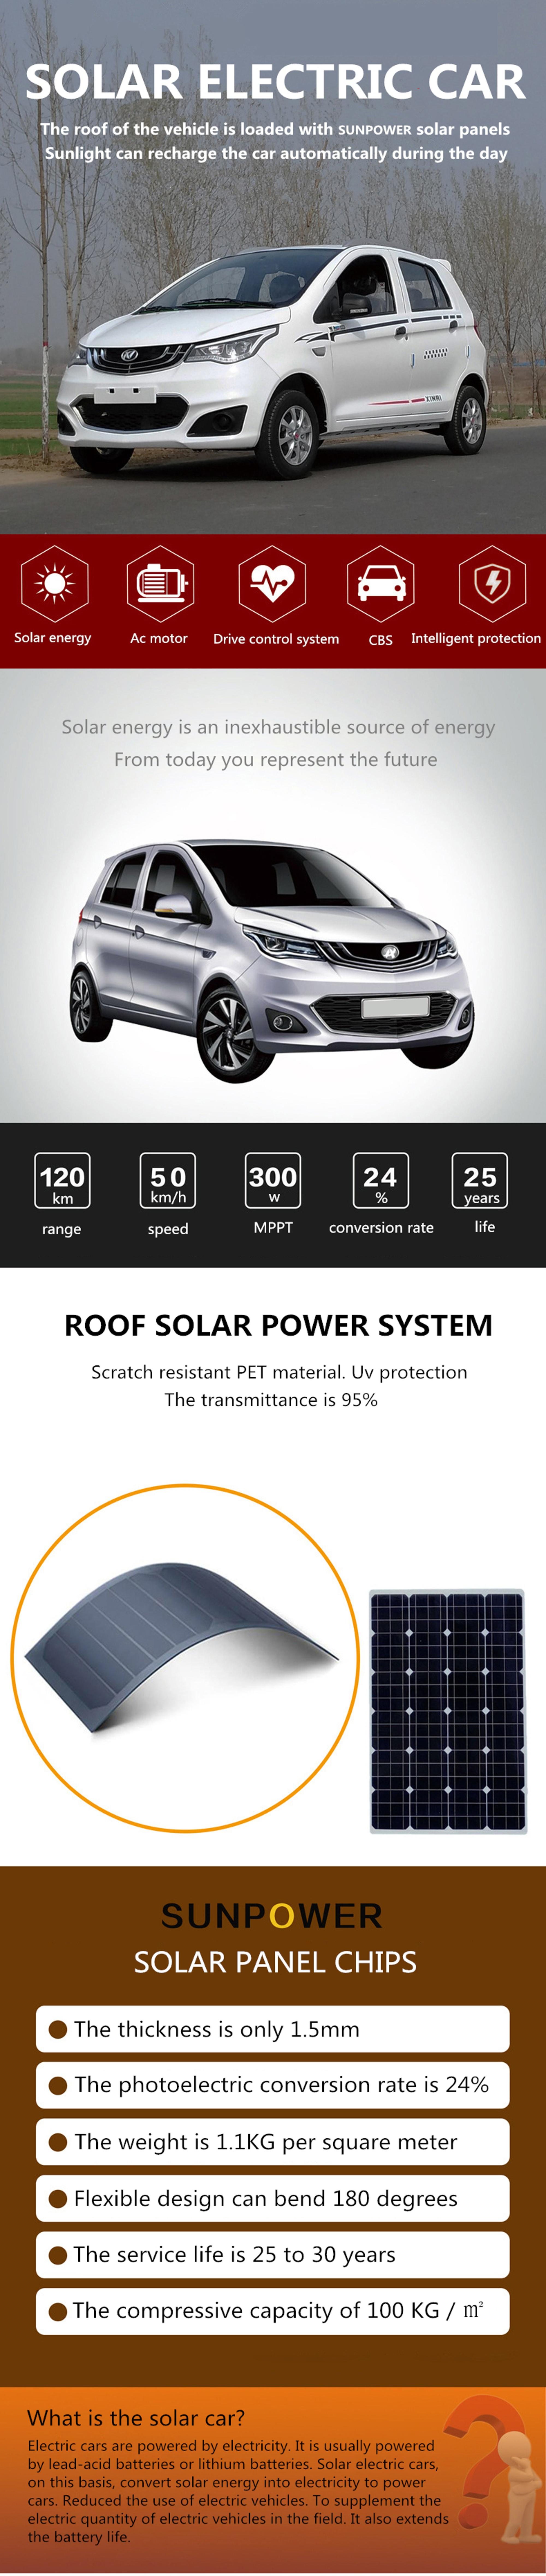 4 Wiel Nieuwe Auto S Solar Elektrische Auto Ev Auto Buy Nieuwe Auto Ev Auto 4 Wiel Nieuwe Auto S Solar Elektrische Auto Ev Auto Product On